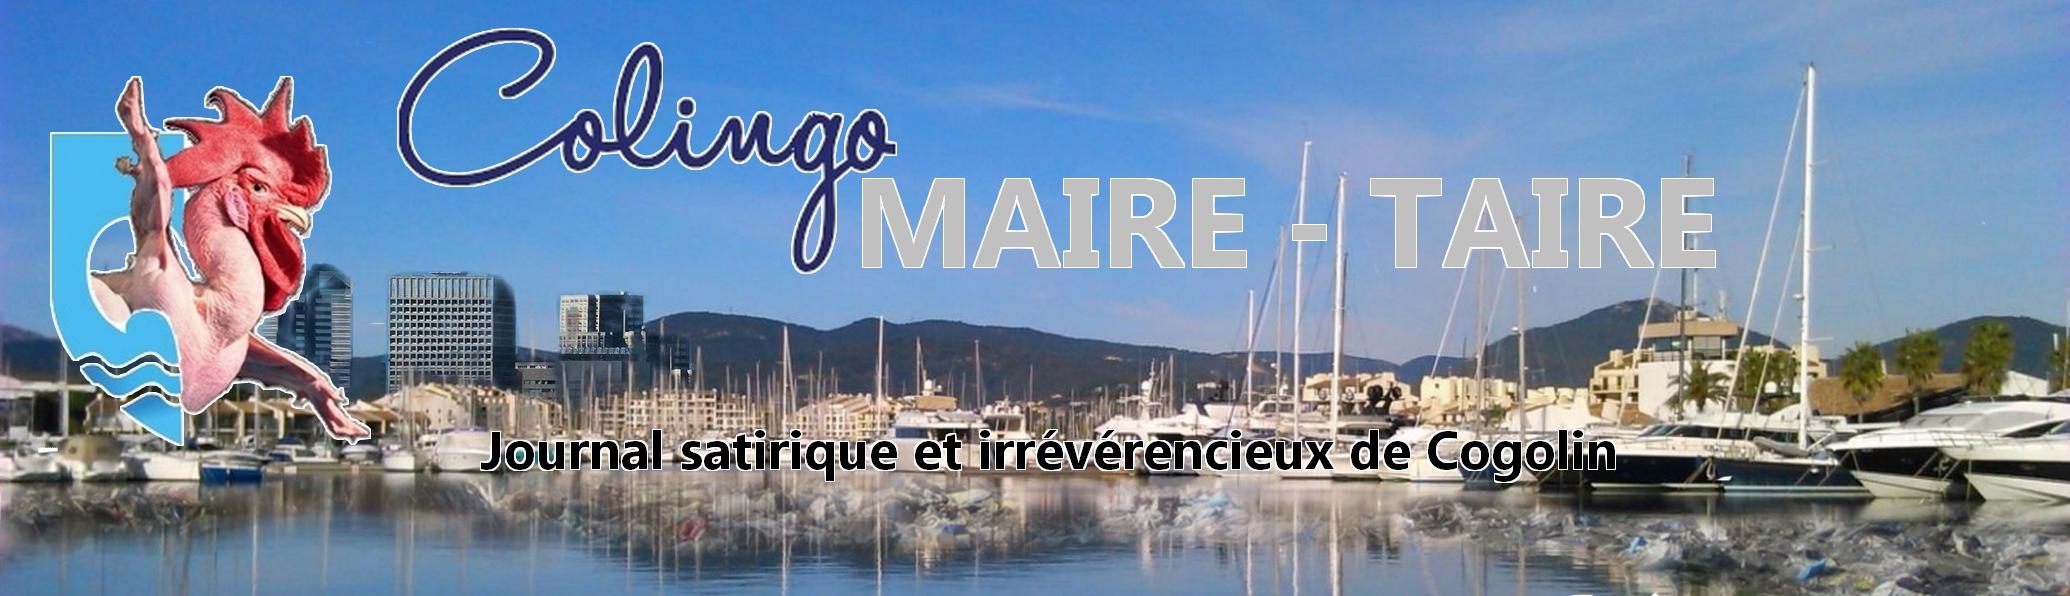 Colingo – Maire-Taire